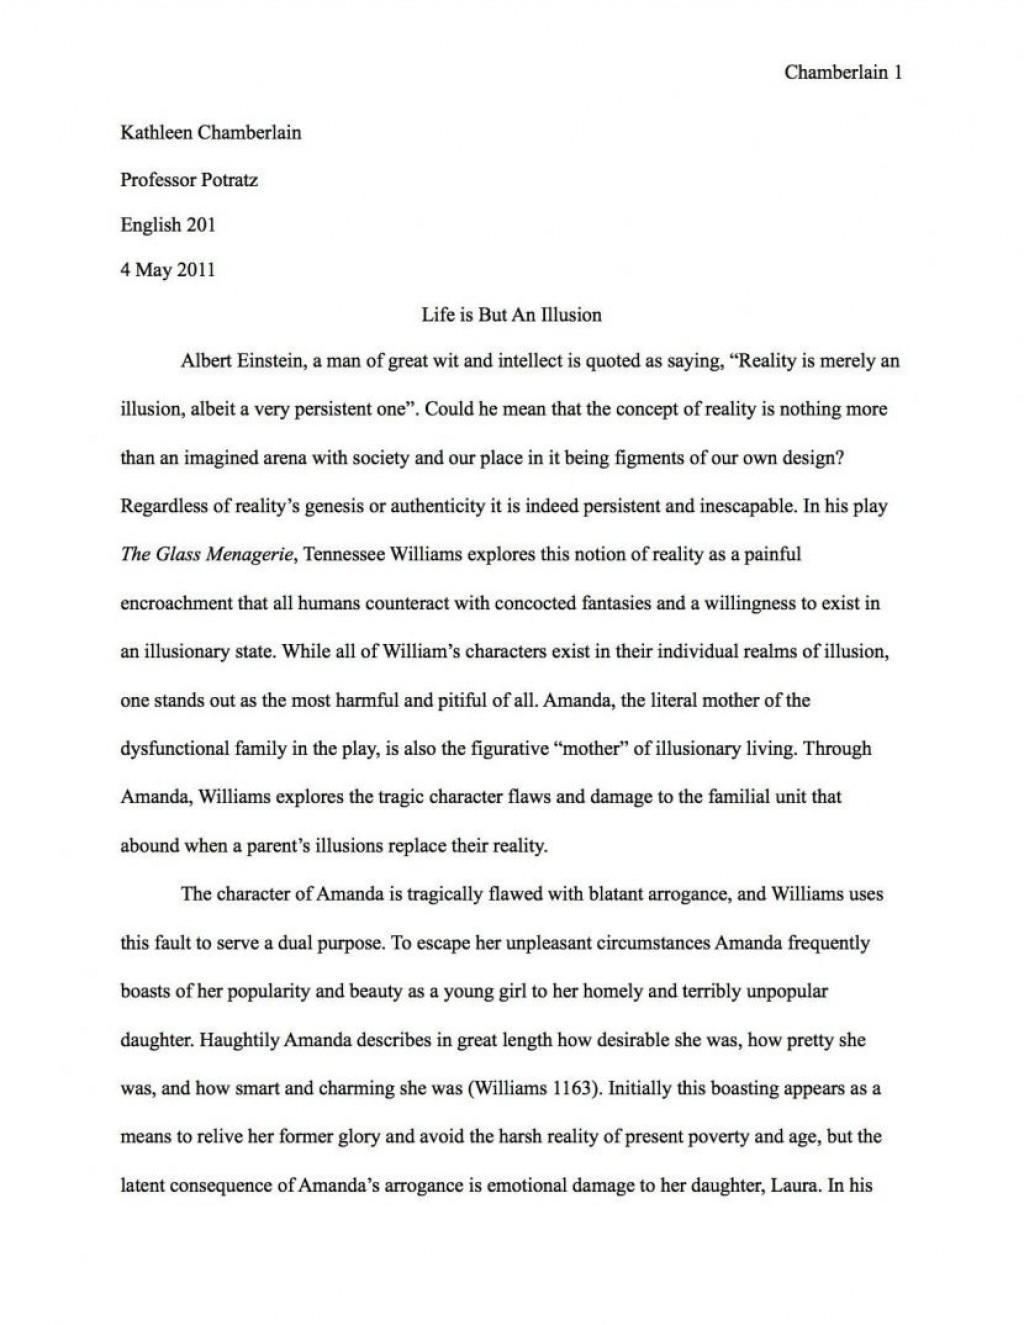 Critical essays on emma